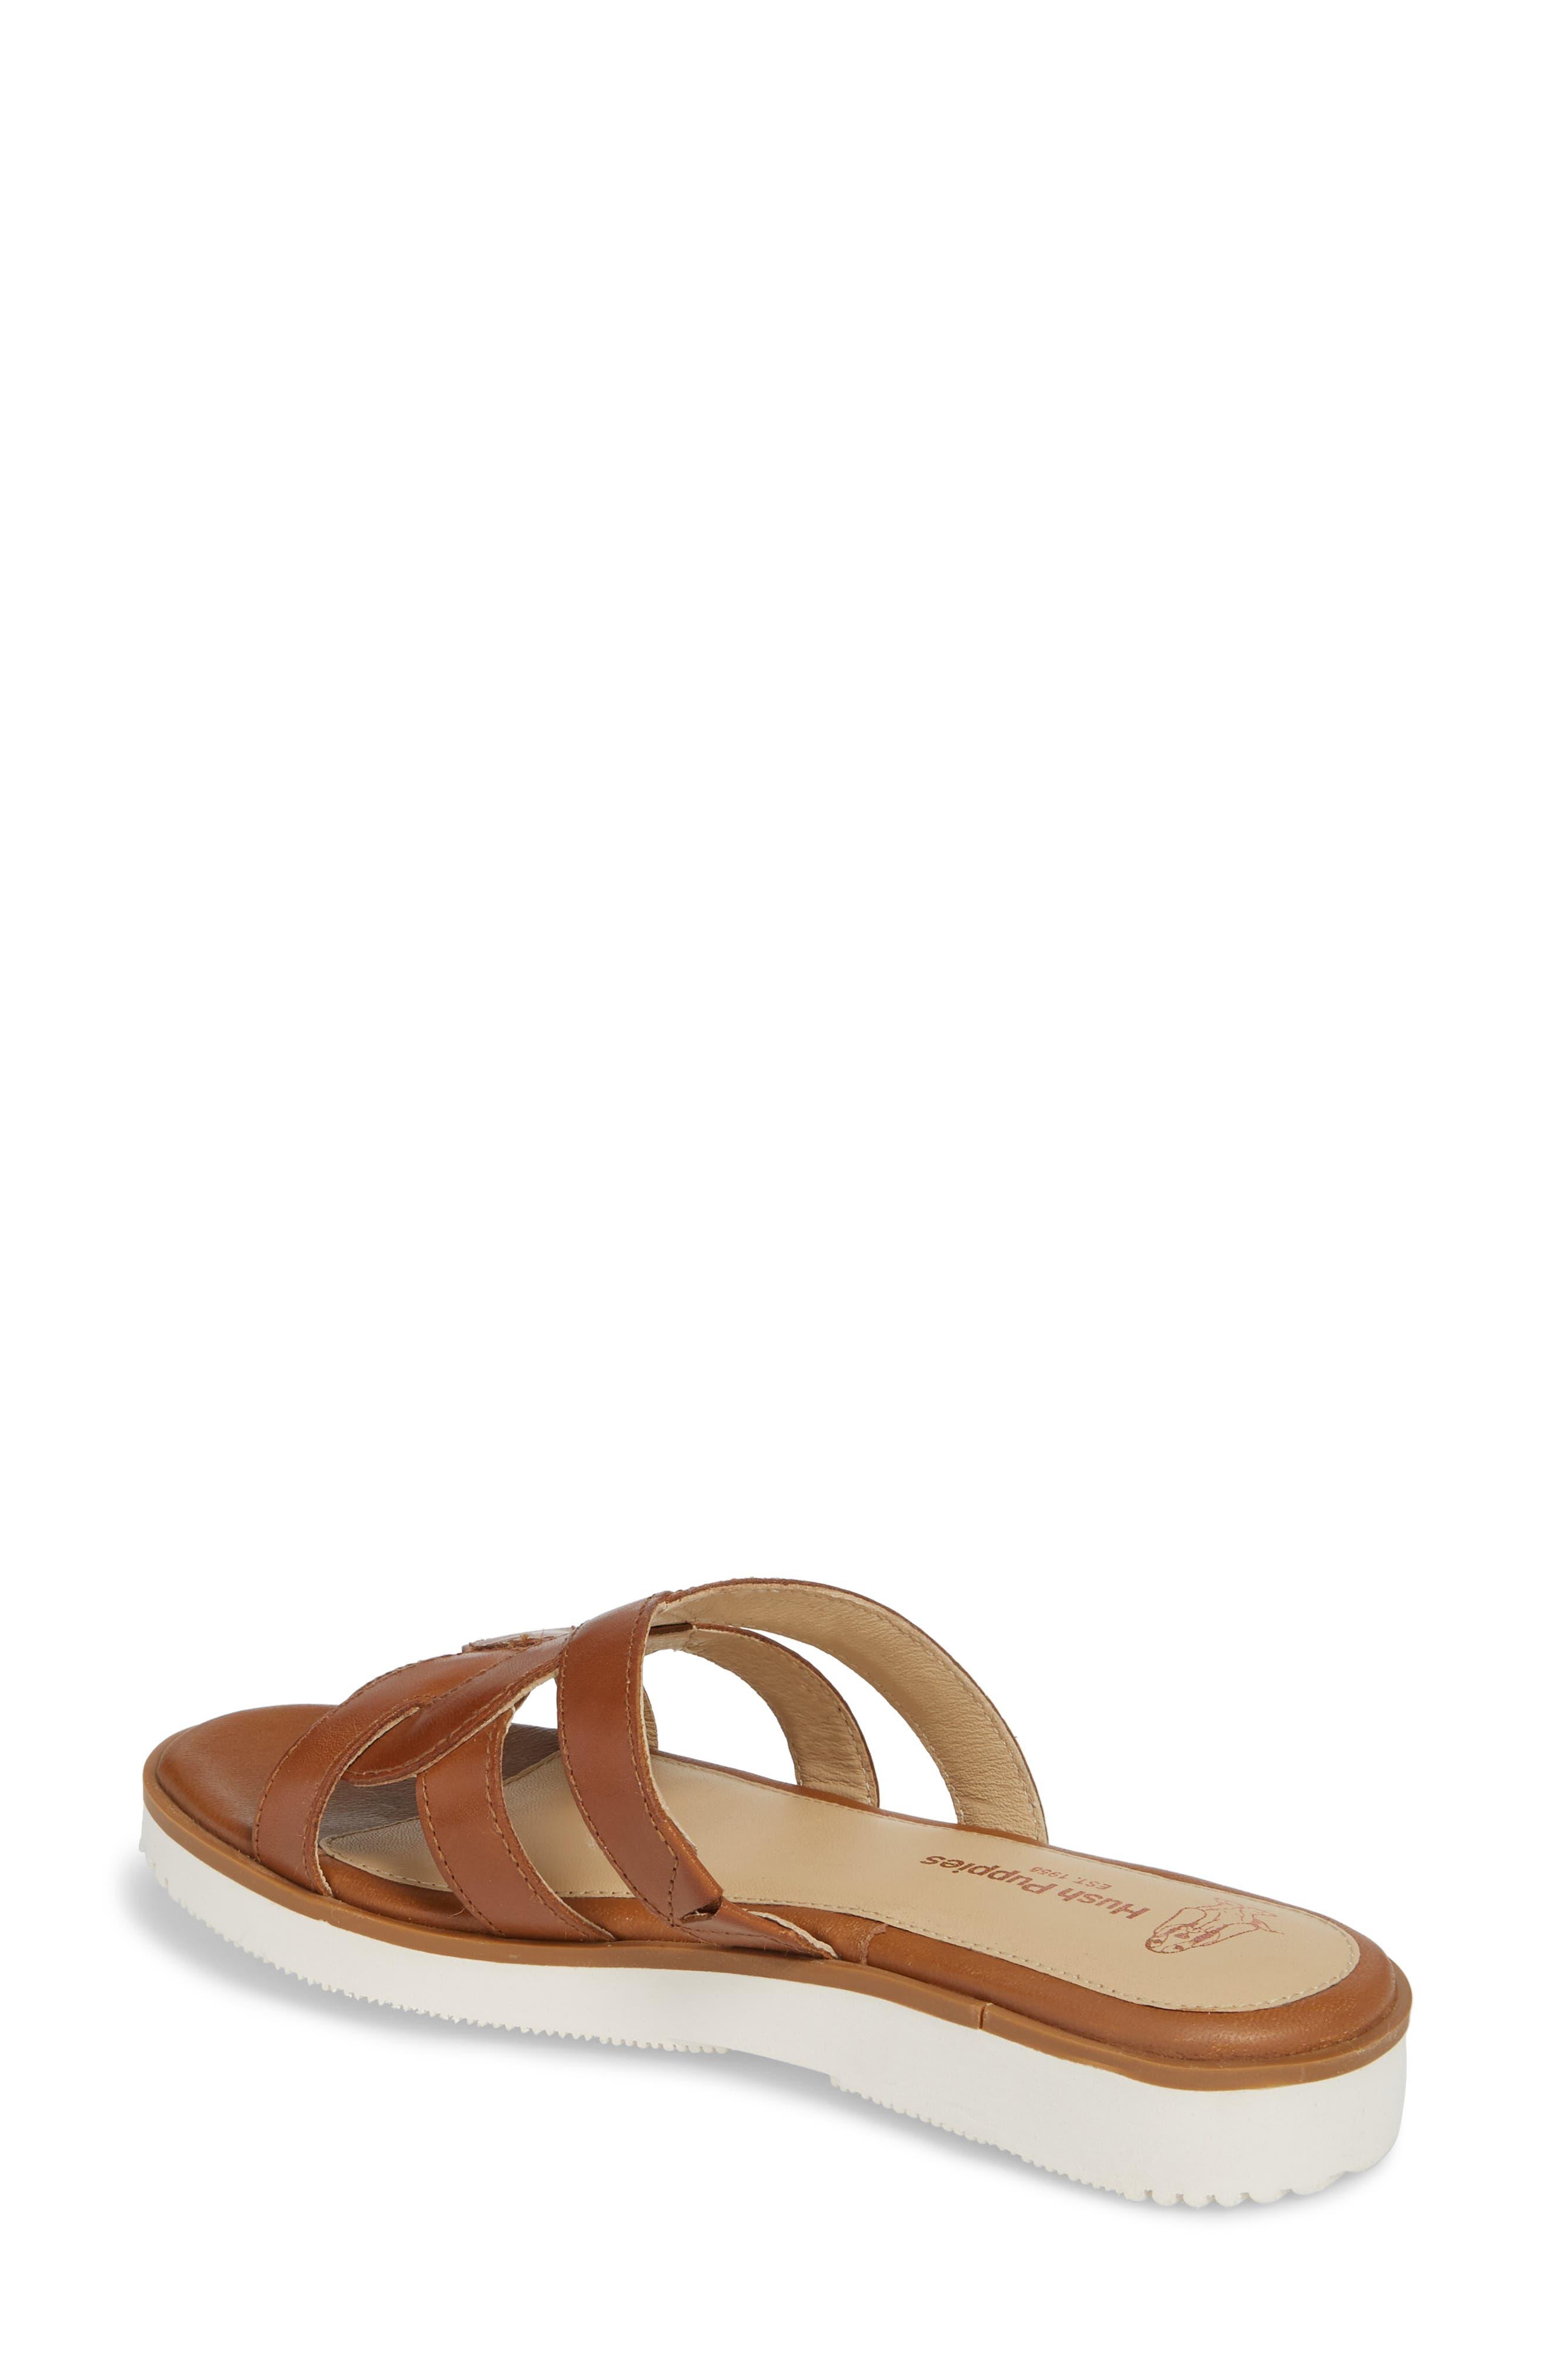 Braid Slide Sandal,                             Alternate thumbnail 2, color,                             Tan Leather